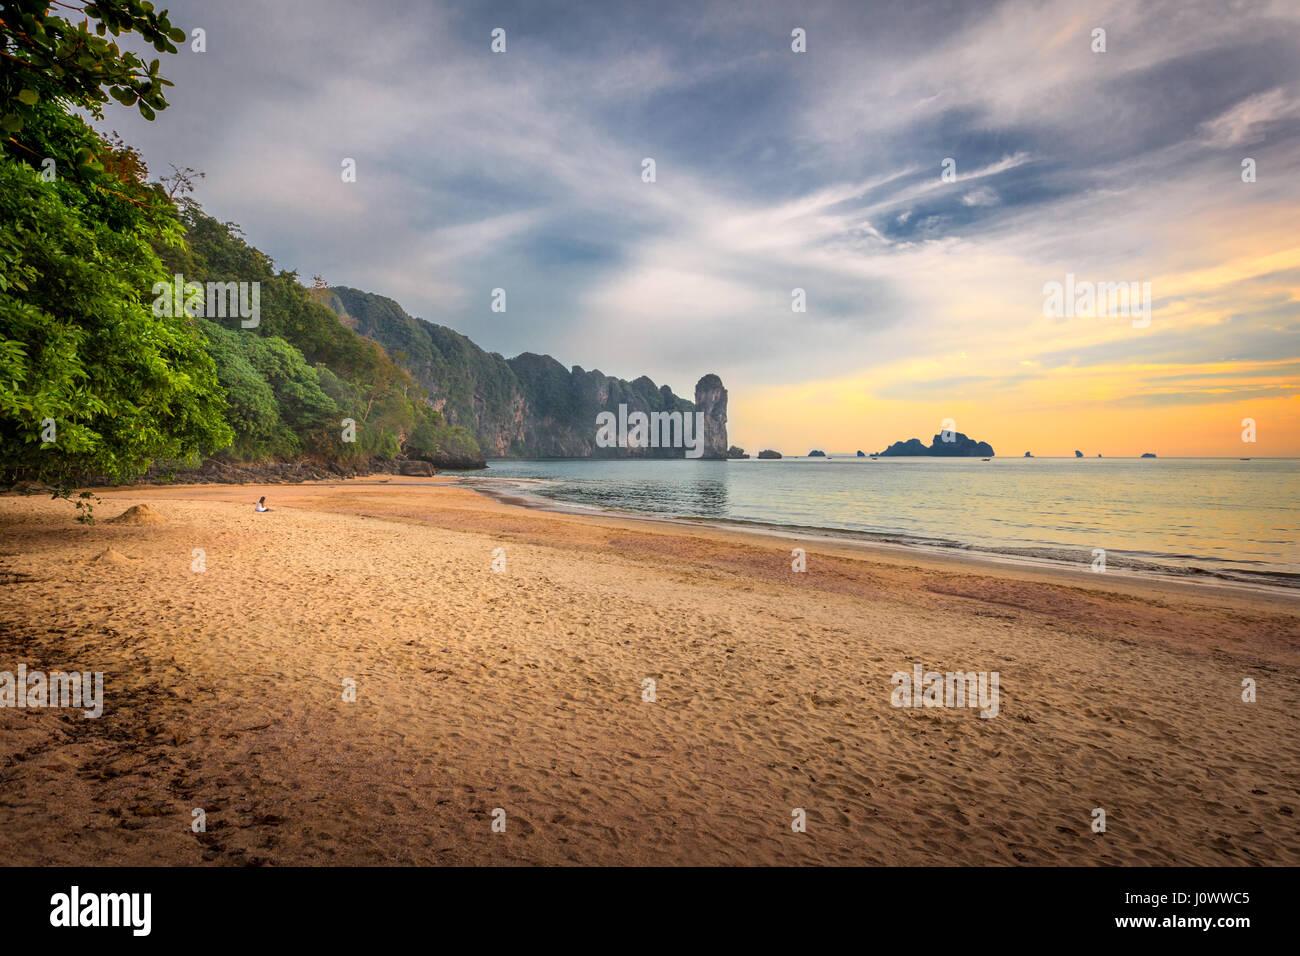 Ao Nang Beach at sunset, Krabi Province, Thailand, Southeast Asia - Stock Image